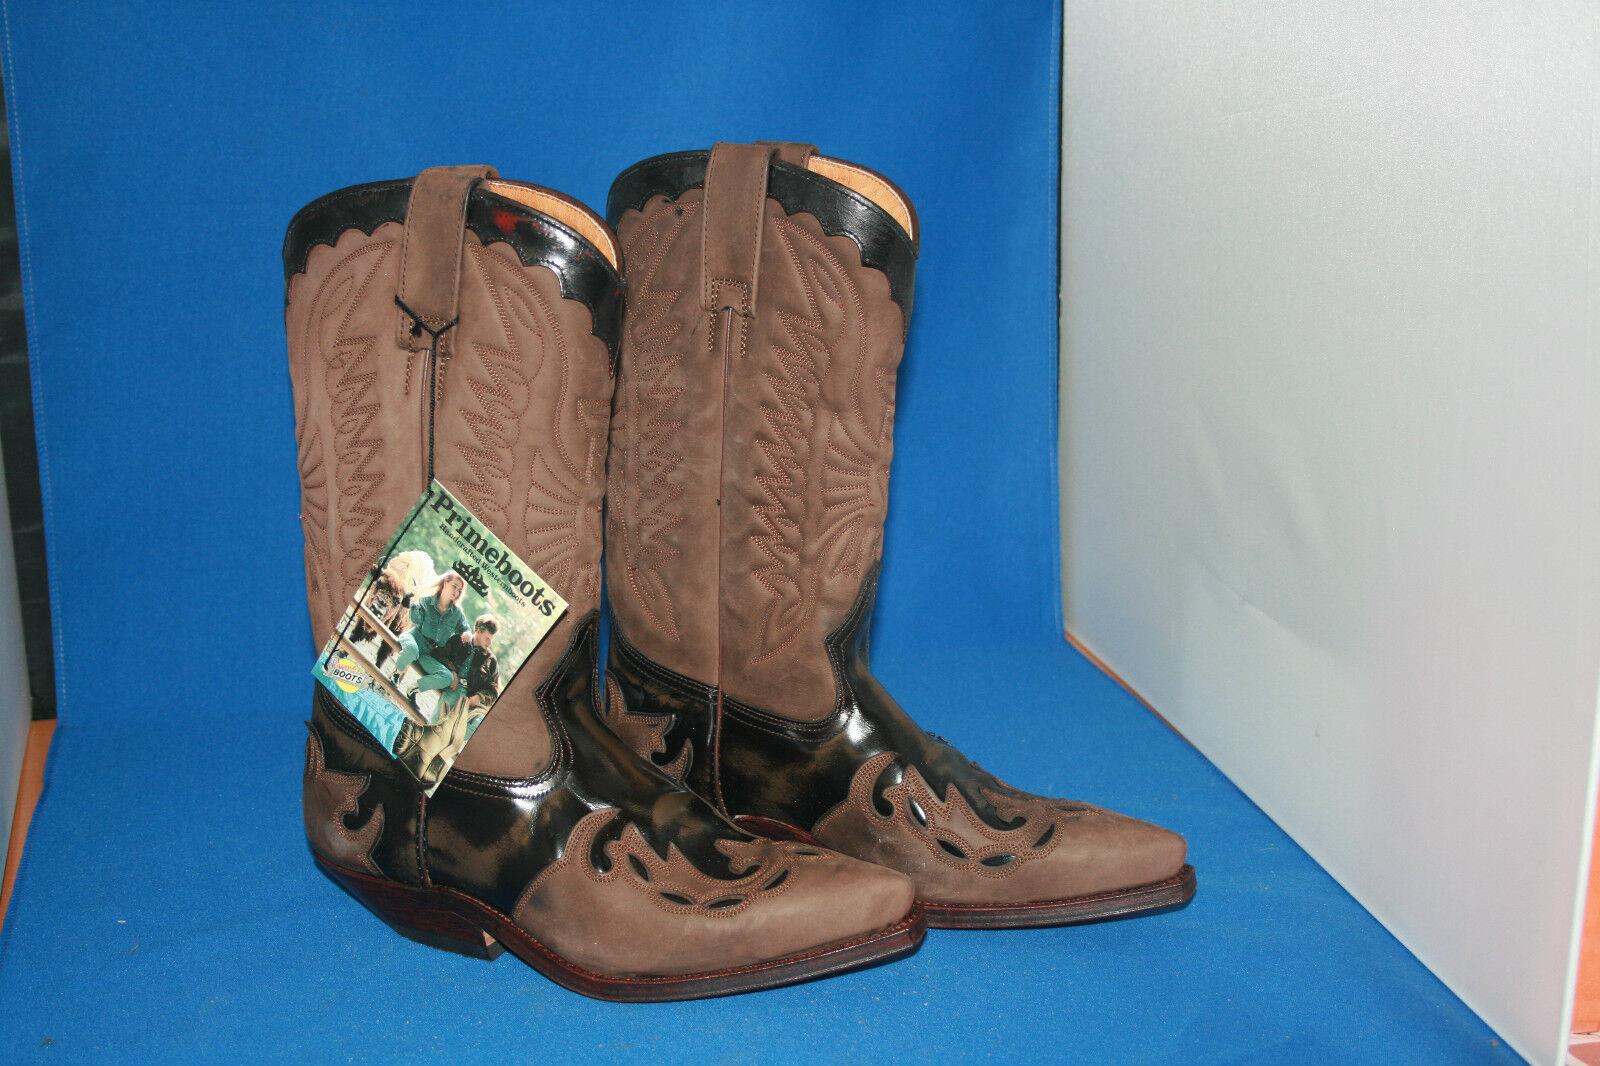 outlet Prime Stivali Cowboy Stivali Stivali Western Western Western NUOVO PELLE HANDMADE GR. 36  Sconto del 60%